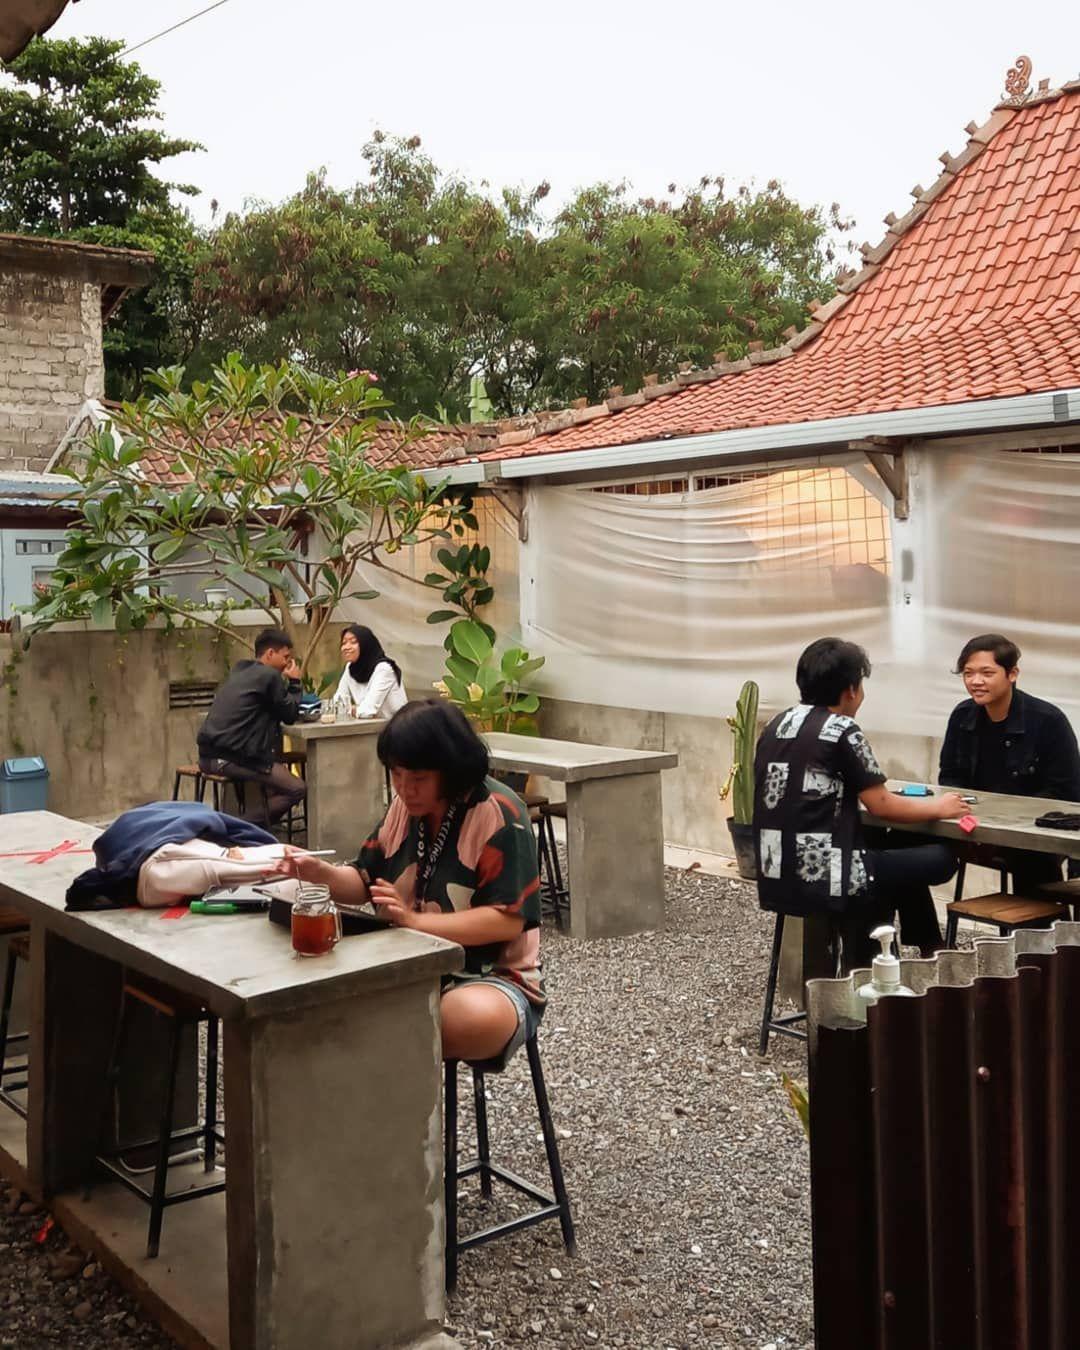 Kedai di Yogyakarta Ini Jual Puluhan Merek Teh Lokal Indonesia